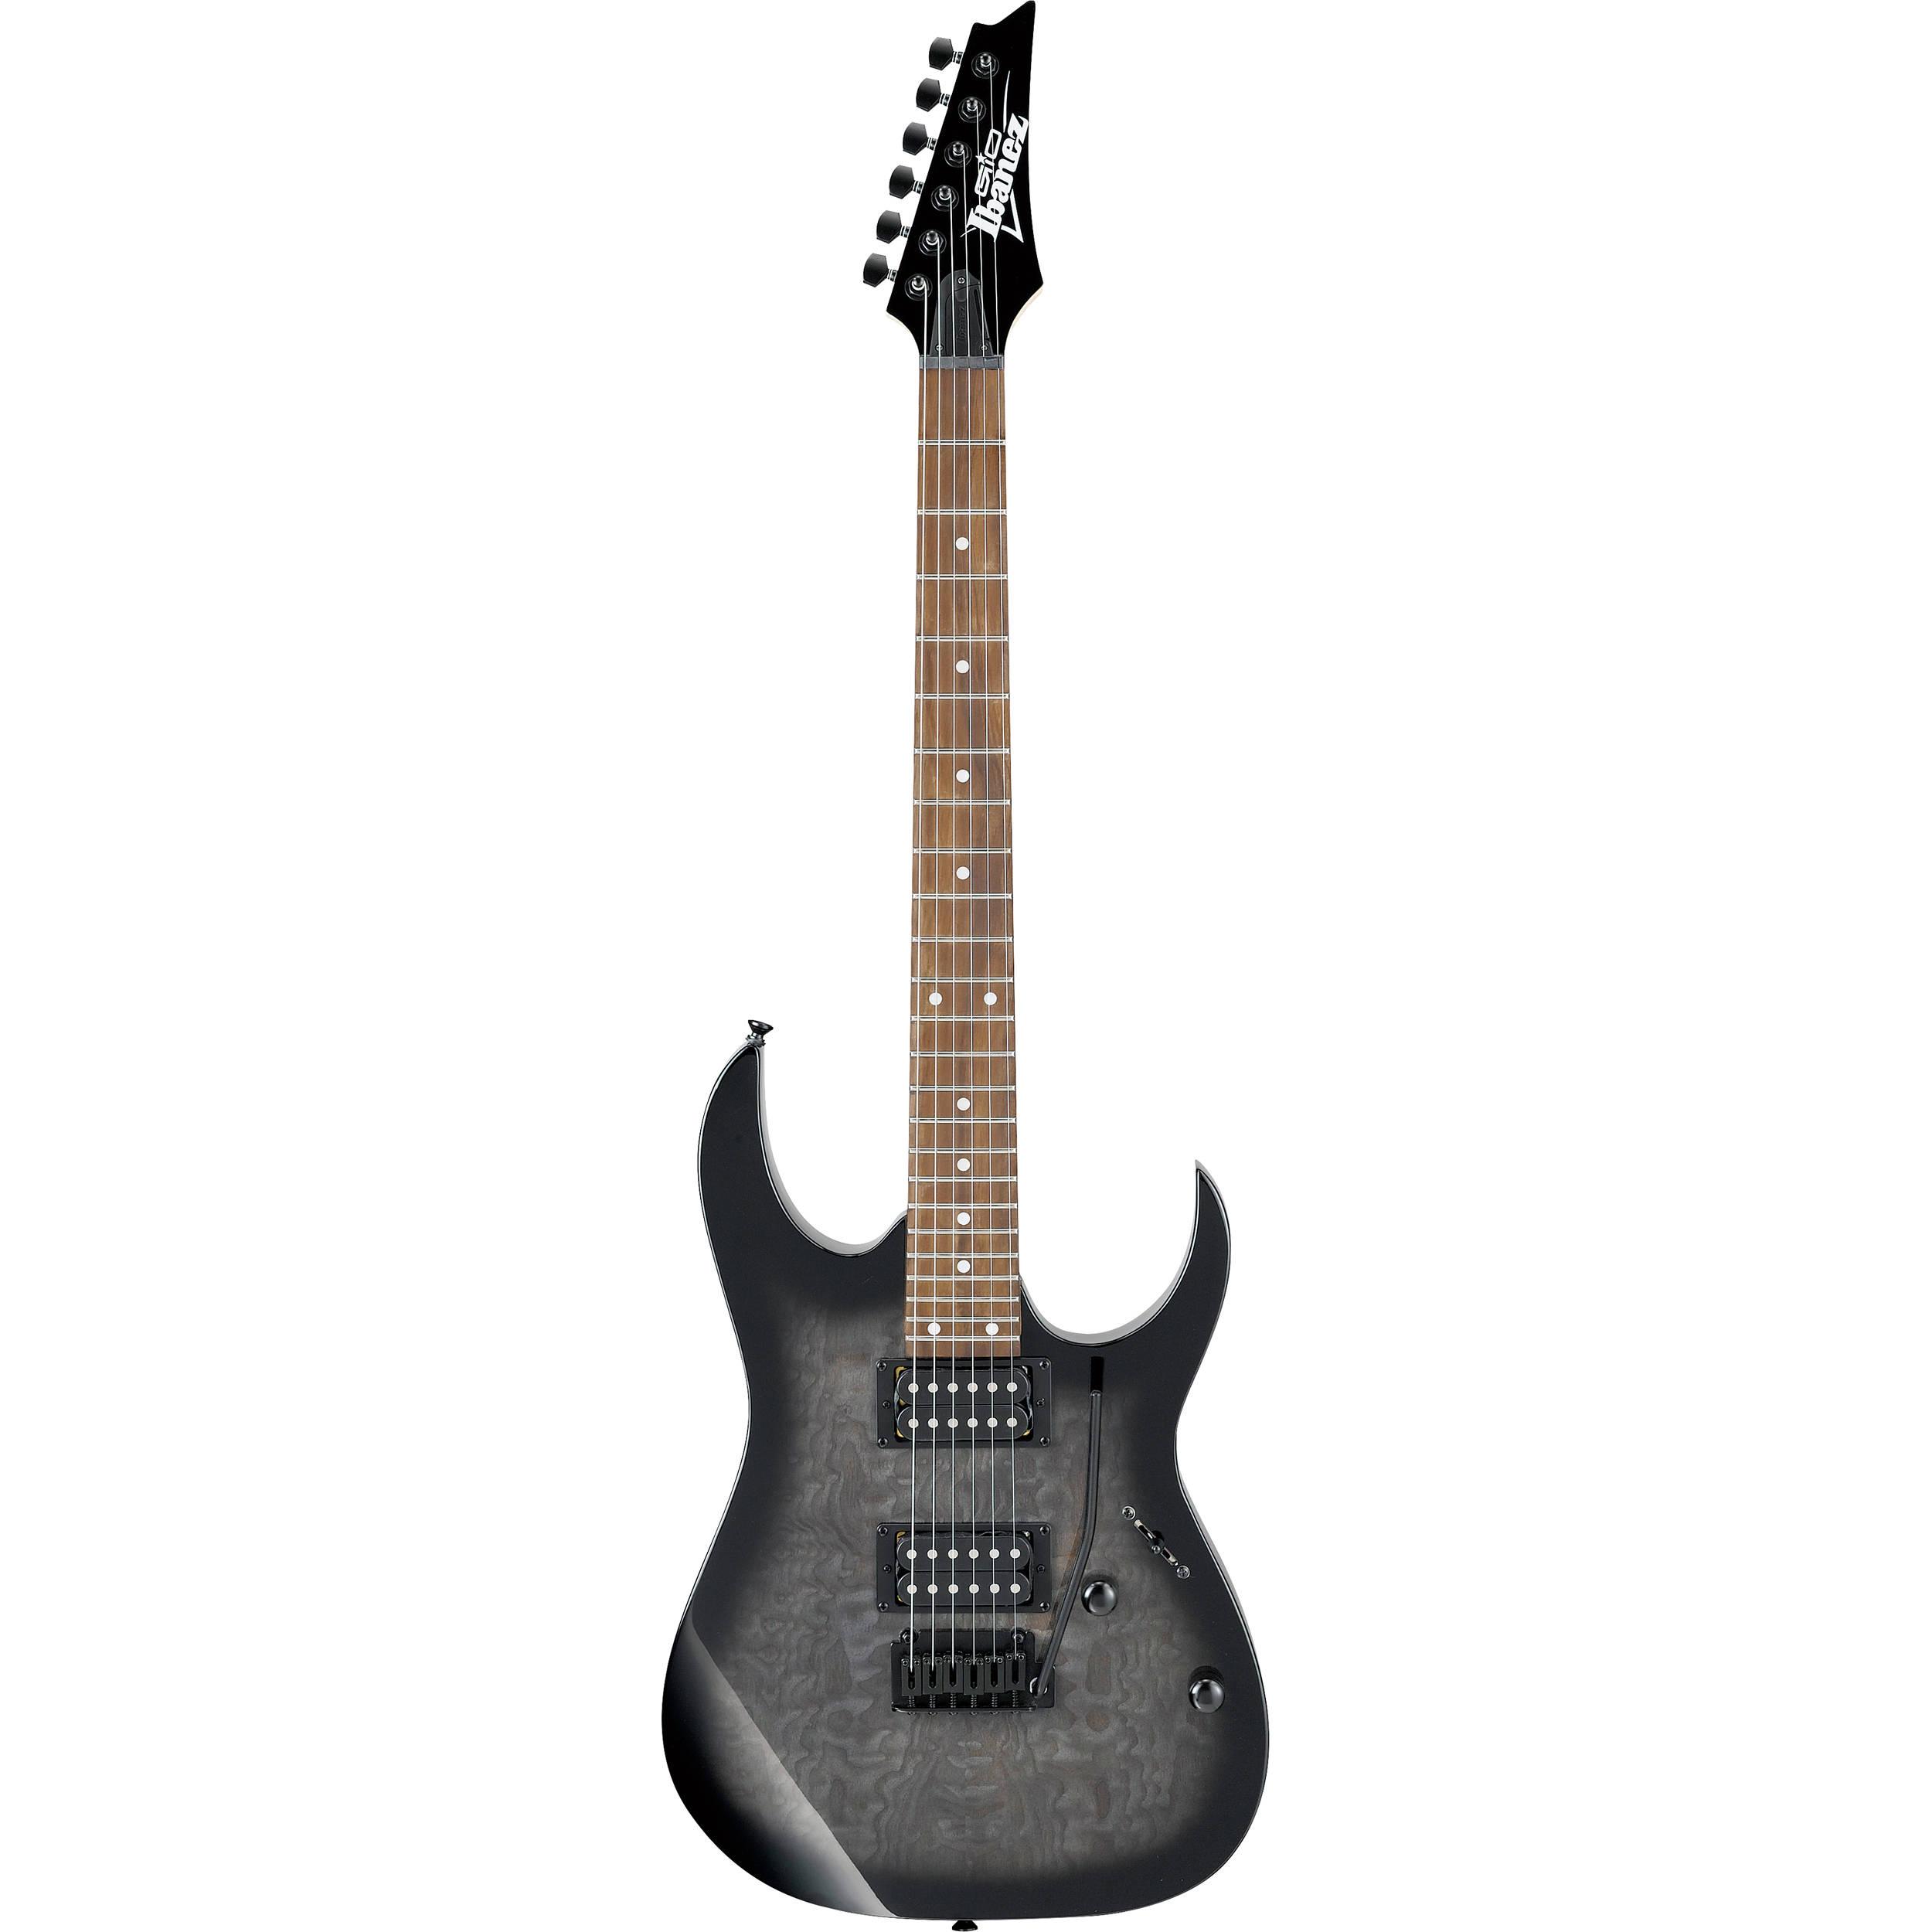 ibanez grga120qh rg series electric guitar grg120qhtks b h photo. Black Bedroom Furniture Sets. Home Design Ideas